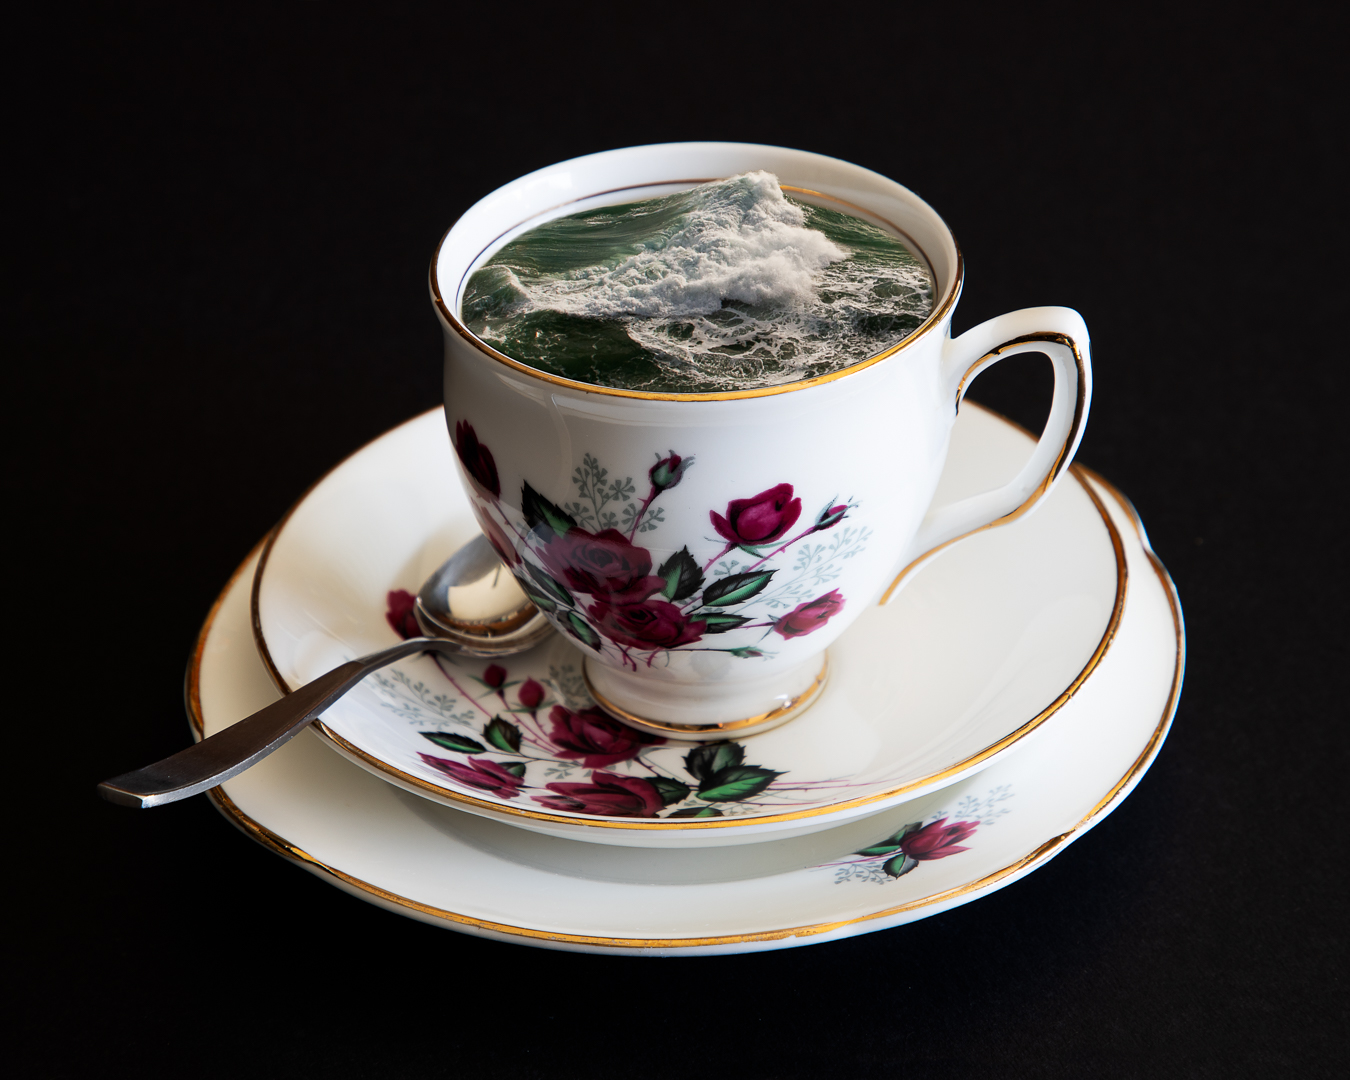 A Storm in a Tea Cup